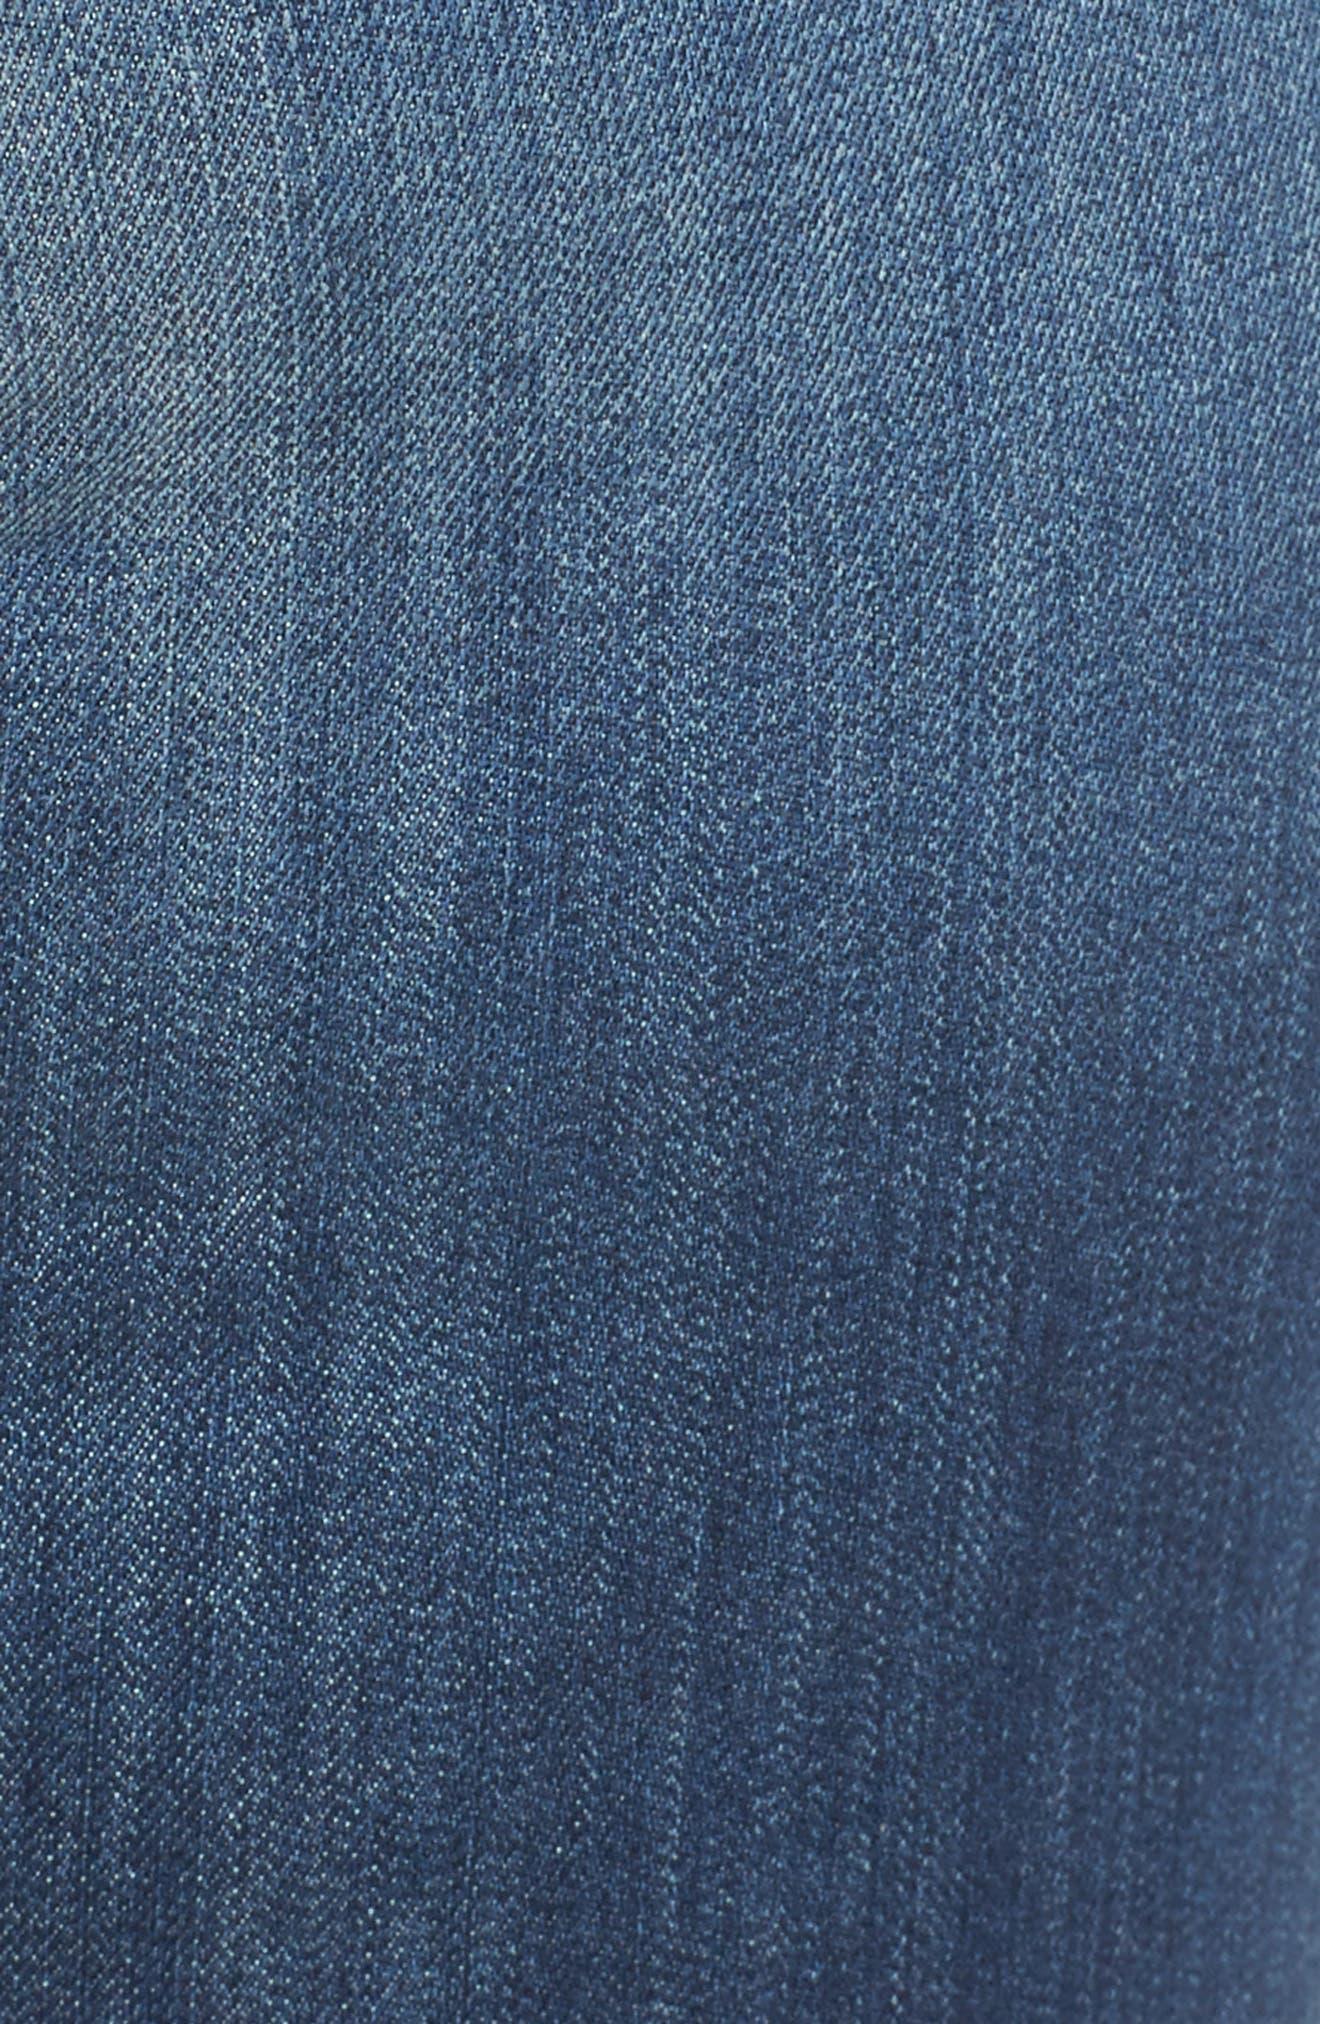 Catherine Boyfriend Jeans,                             Alternate thumbnail 5, color,                             400